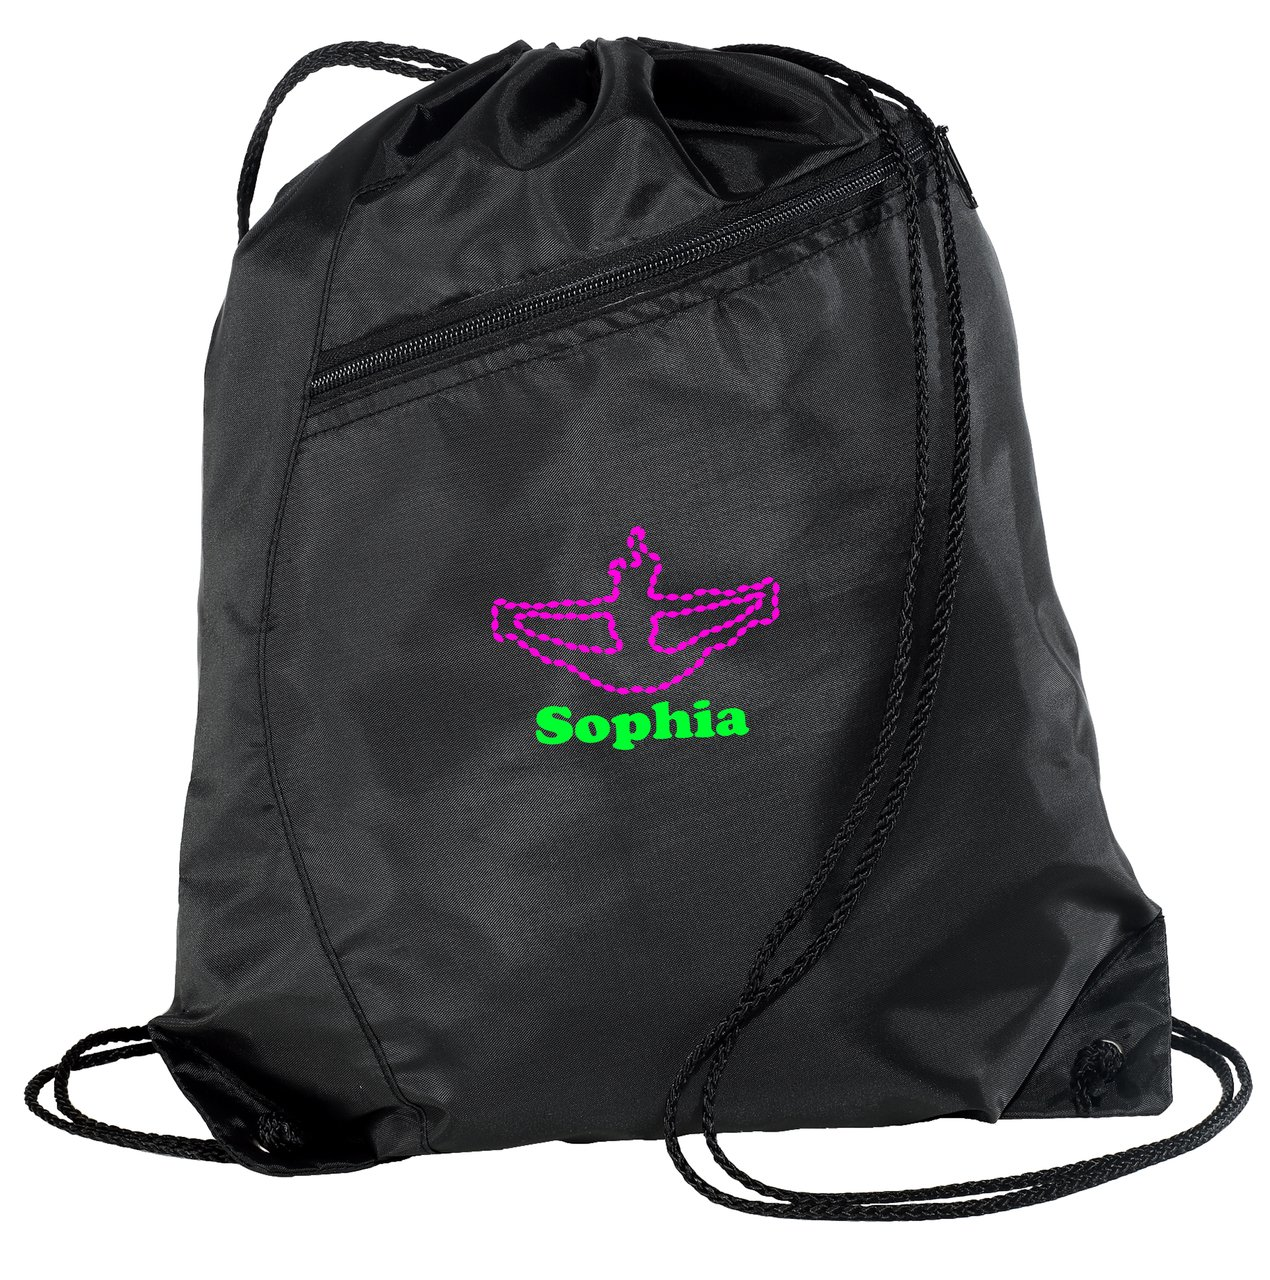 Personalized Cheer巾着カラーブロックCinch Packバックパック B018KWYITI ブラック/ブラック ブラック/ブラック